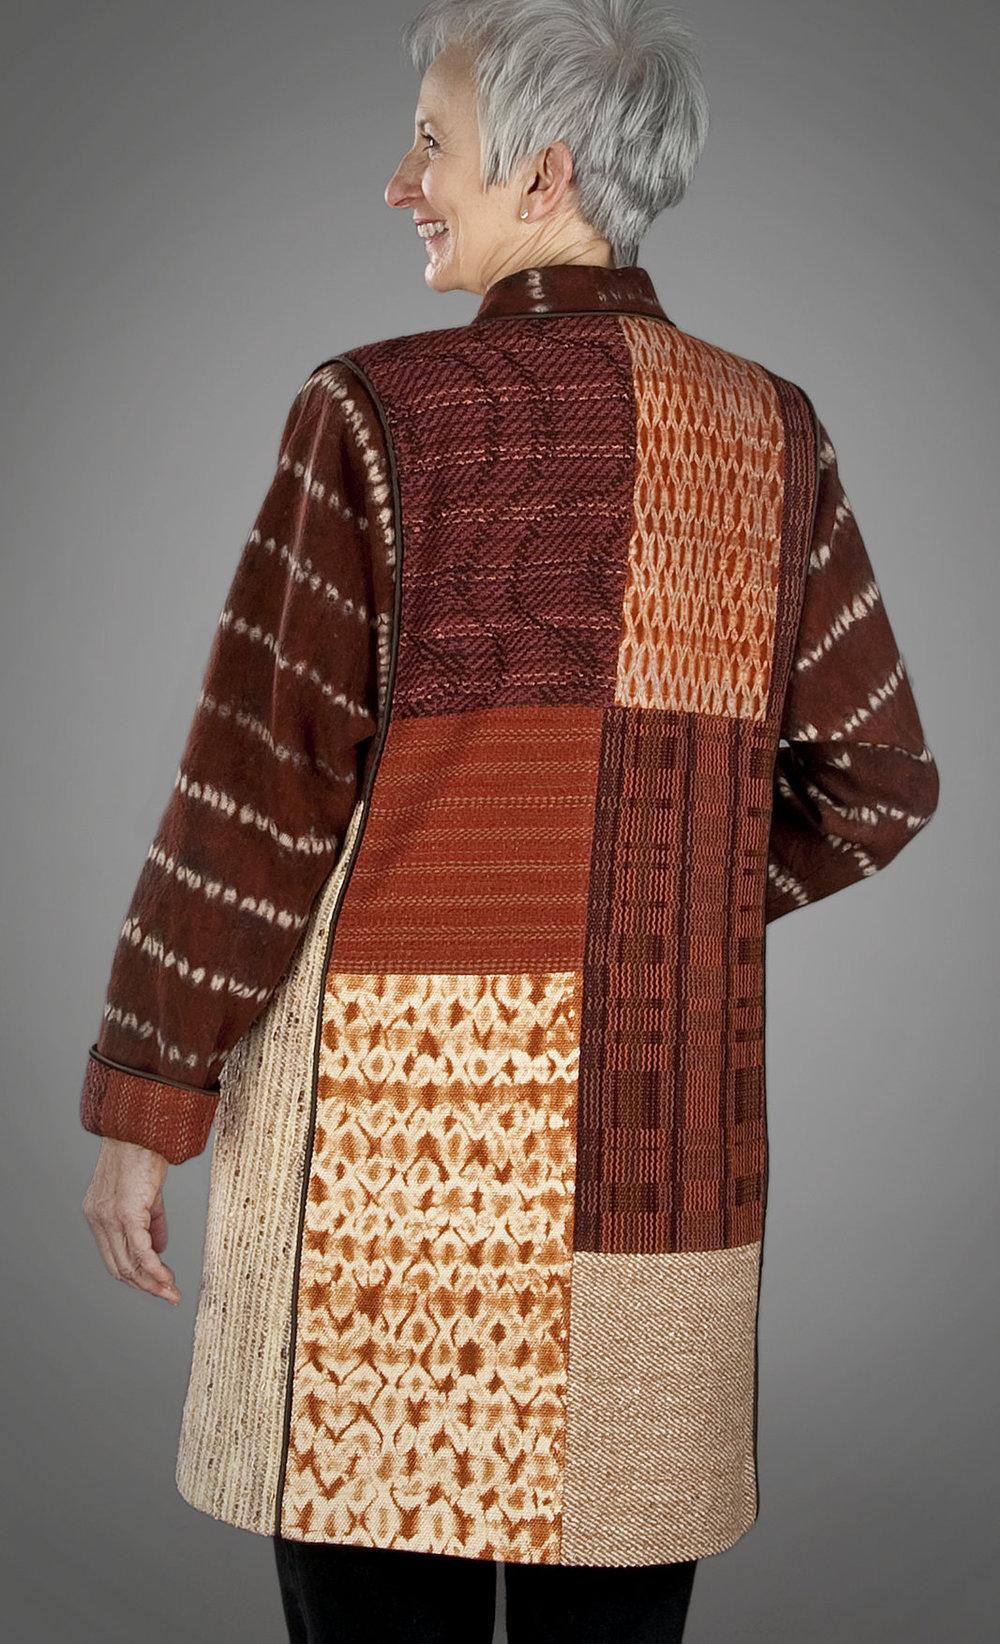 Liz Spear Hand Woven, Art-To-Wear, Clothing-001.jpg